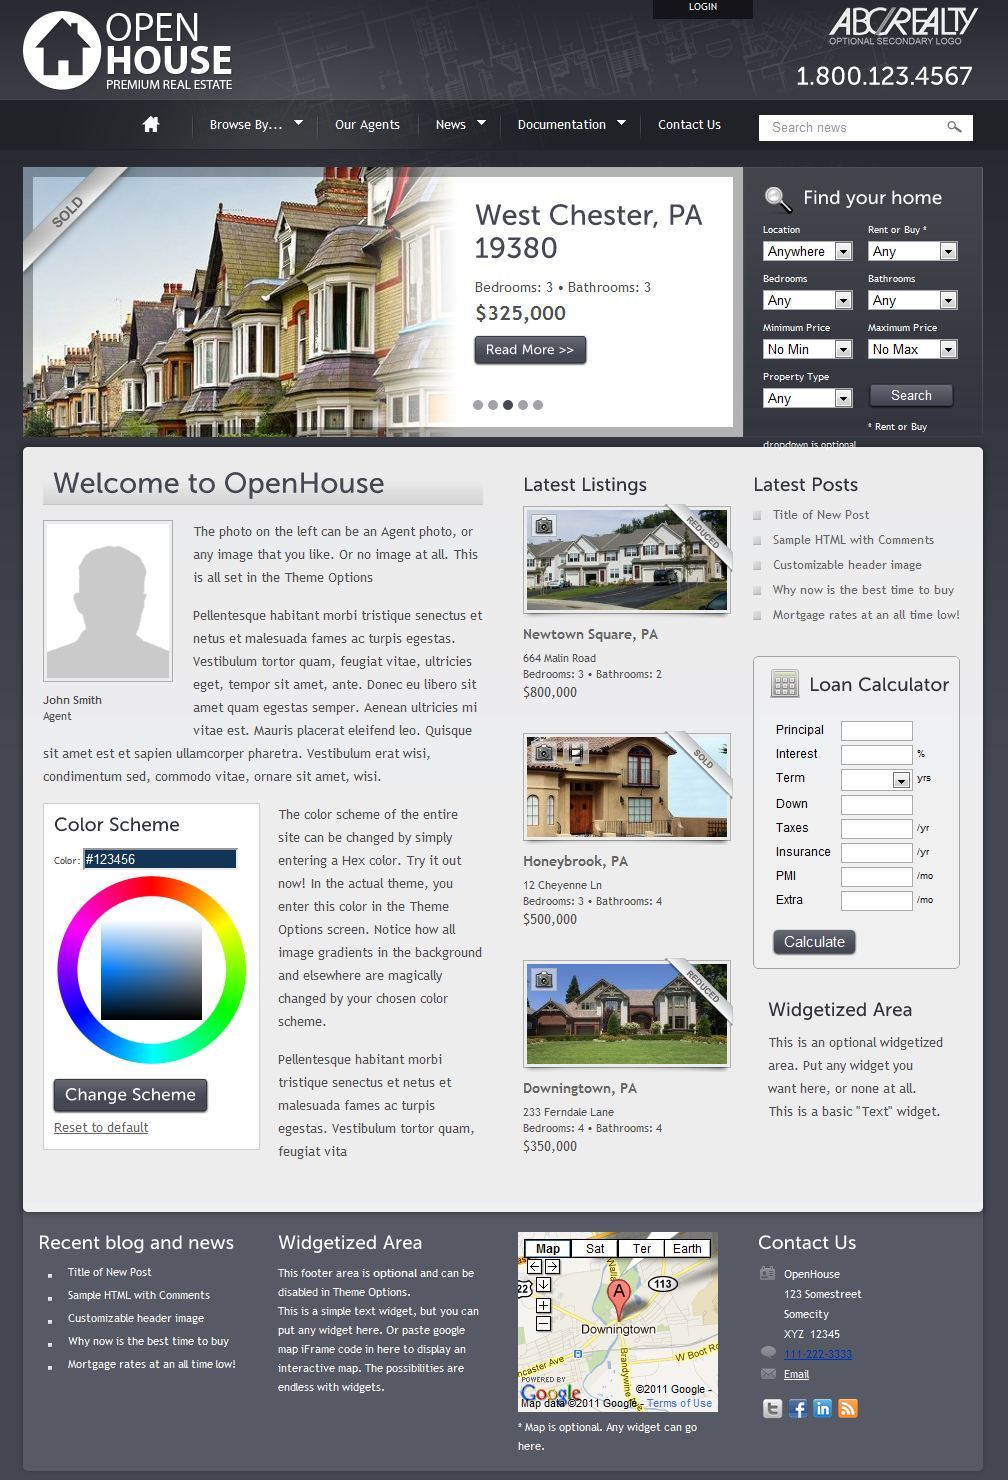 http://3.s3.envato.com/files/6615227/02_homepage_openhouse.jpg